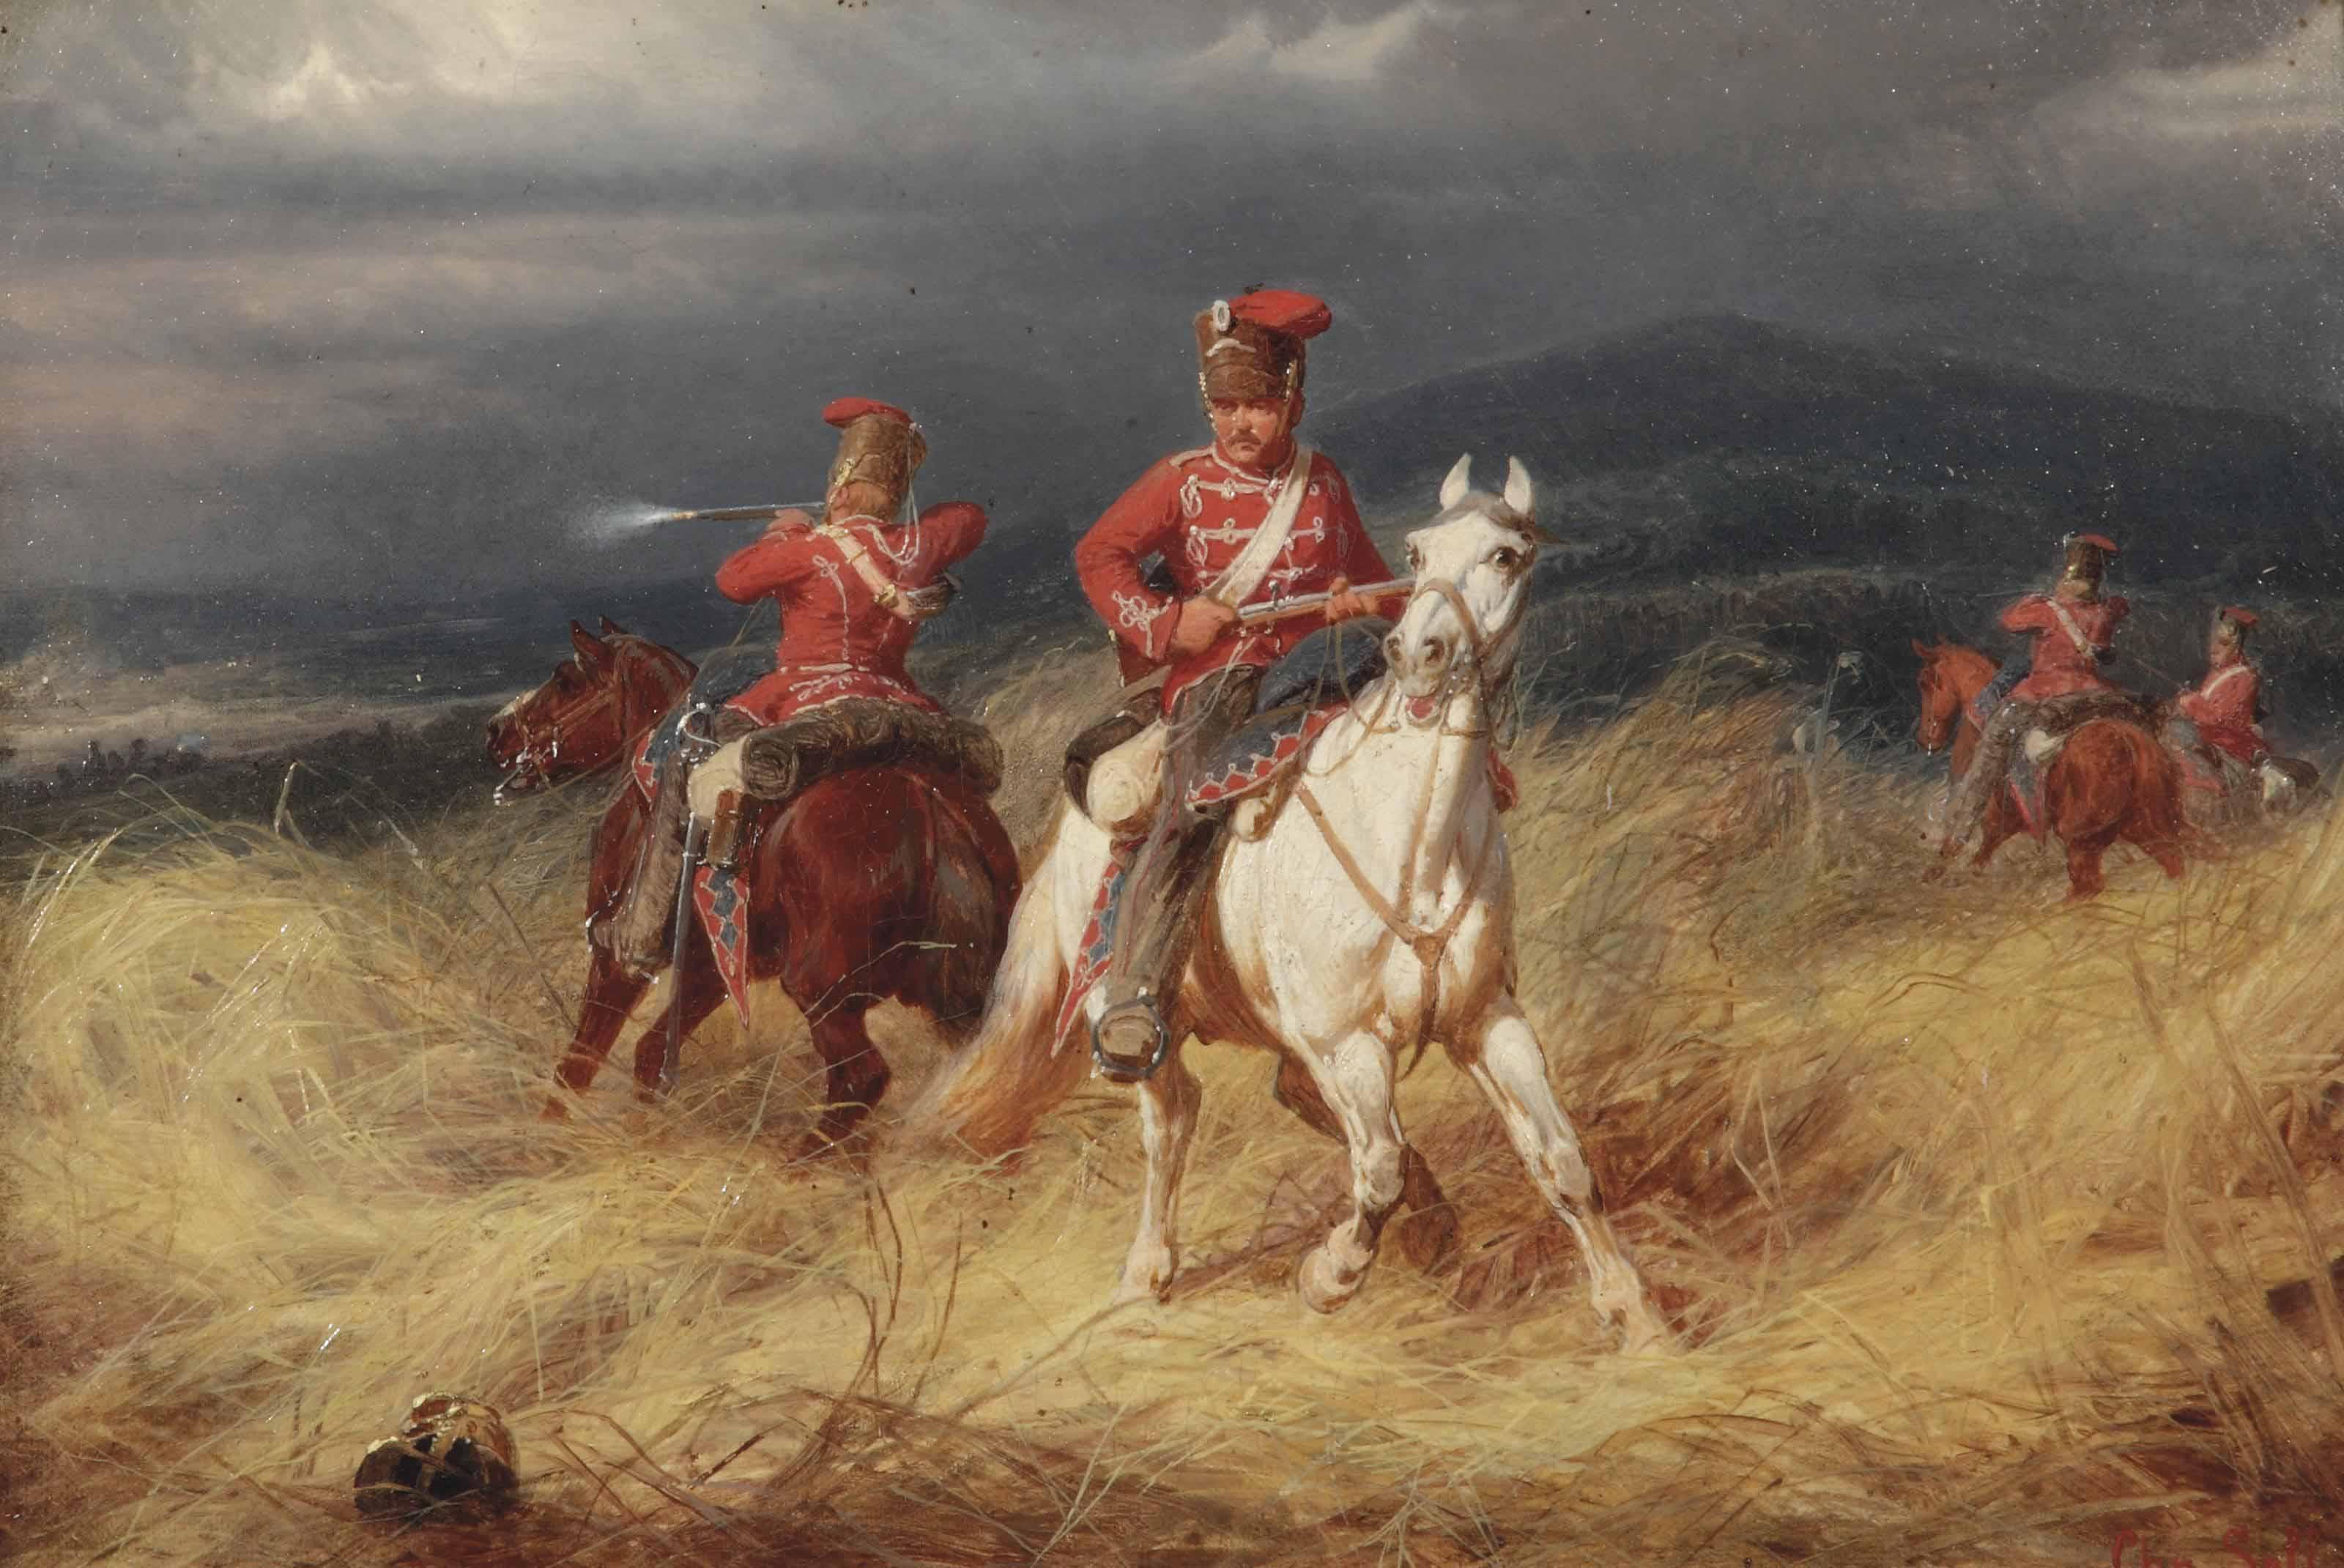 Hussars in battle